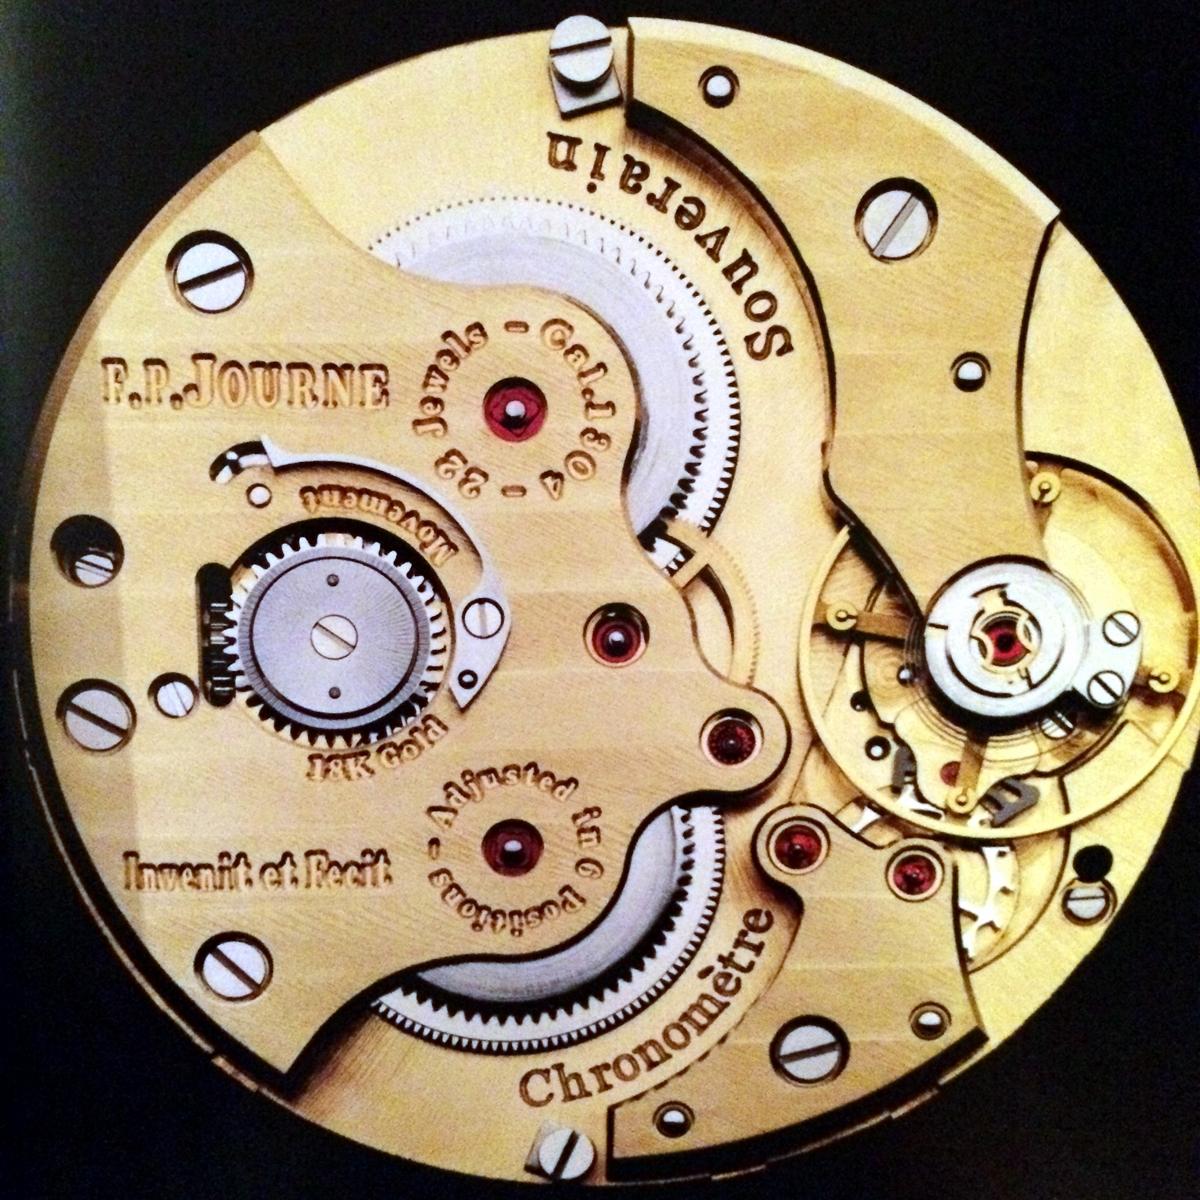 12 design z zegarkiem w ręku luksusowe zegarki SIHH Geneve lifestyle forelements blog